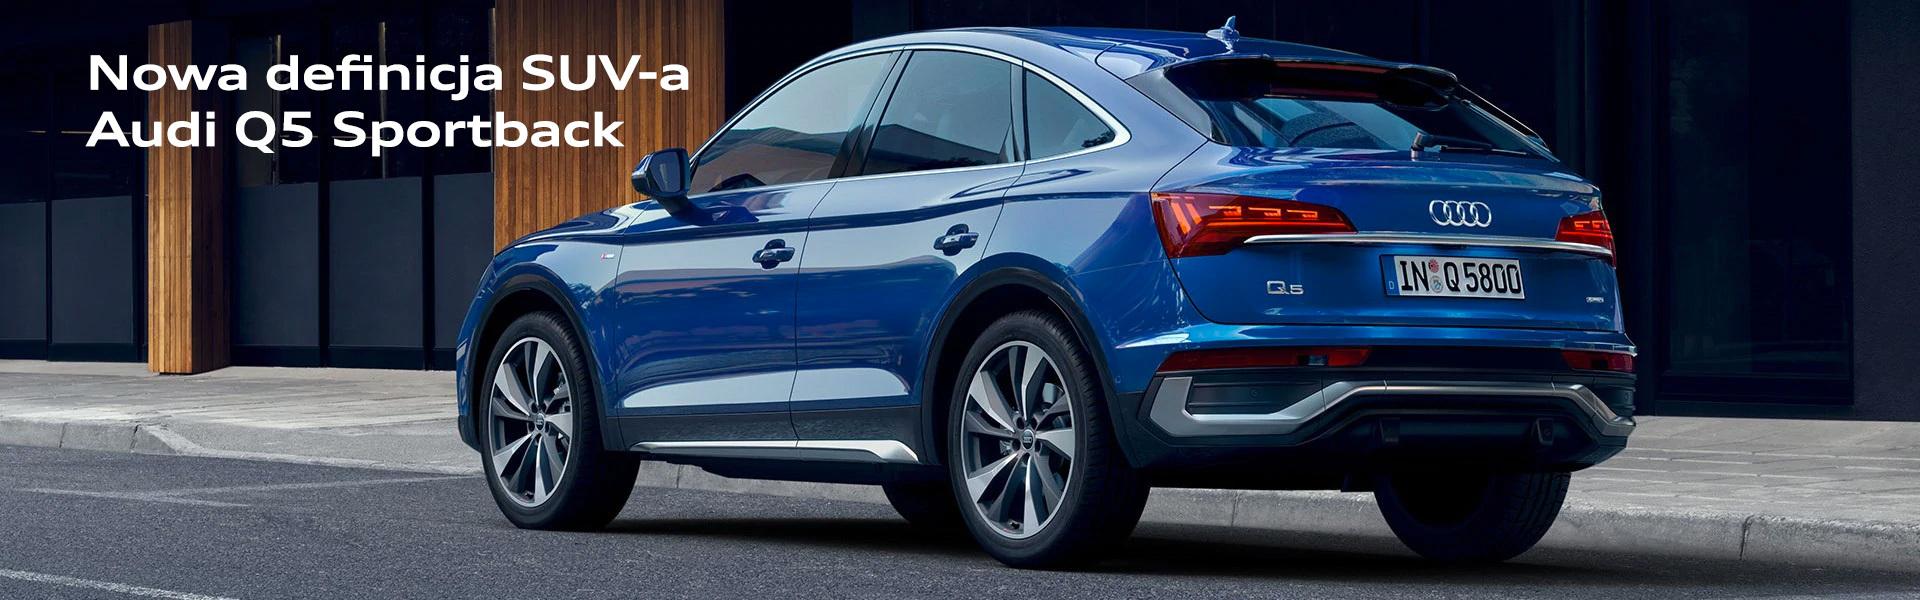 Nowa definicja SUVa Audi Q5 Sportback